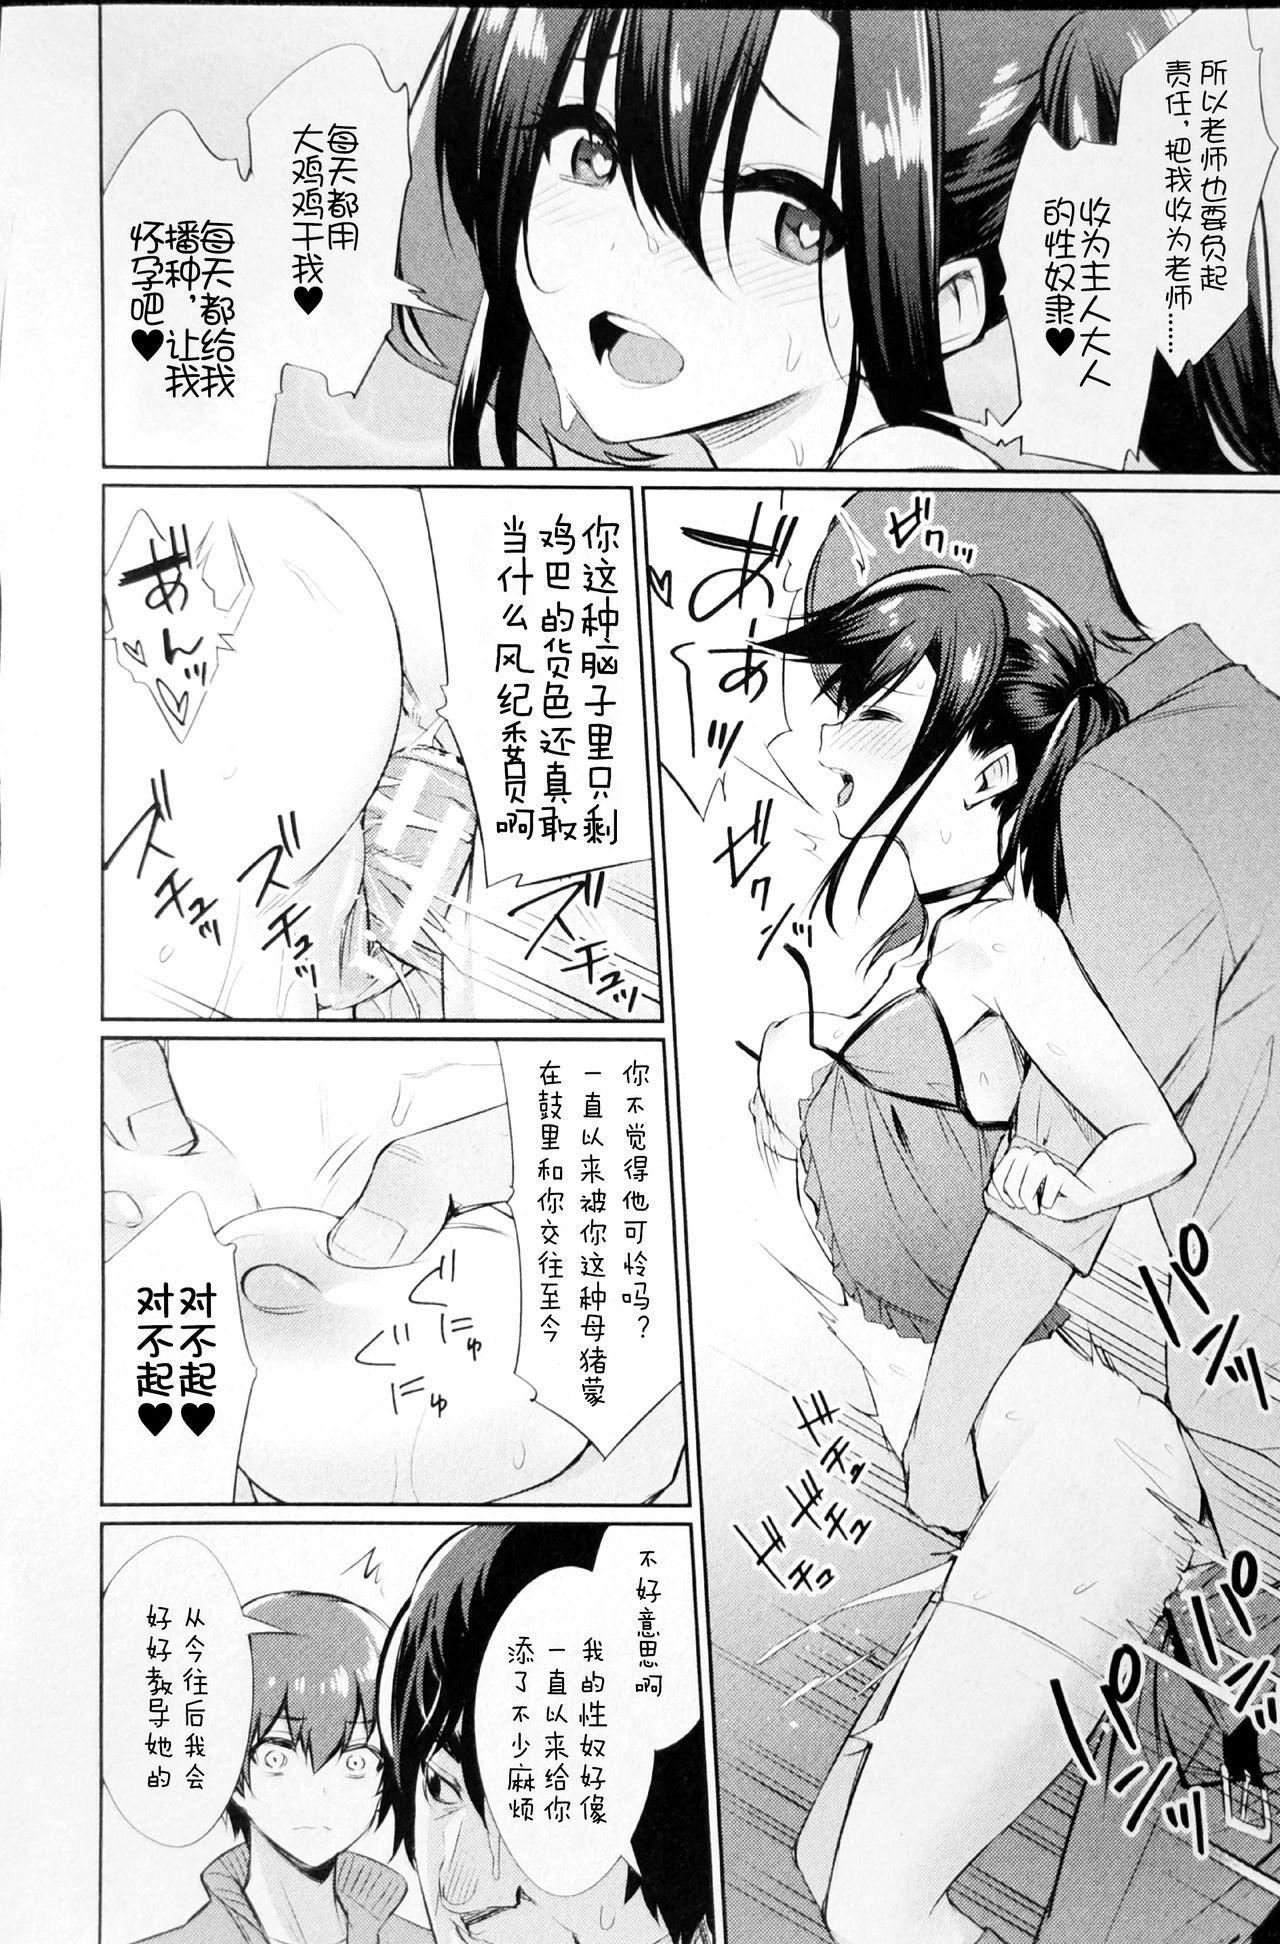 [yasu]Saimin Gakusei Shidou ~Amagusa Nao no Baai~Kouhen2 (COMIC Unreal 2020-04 Vol. 84) [Chinese] 7